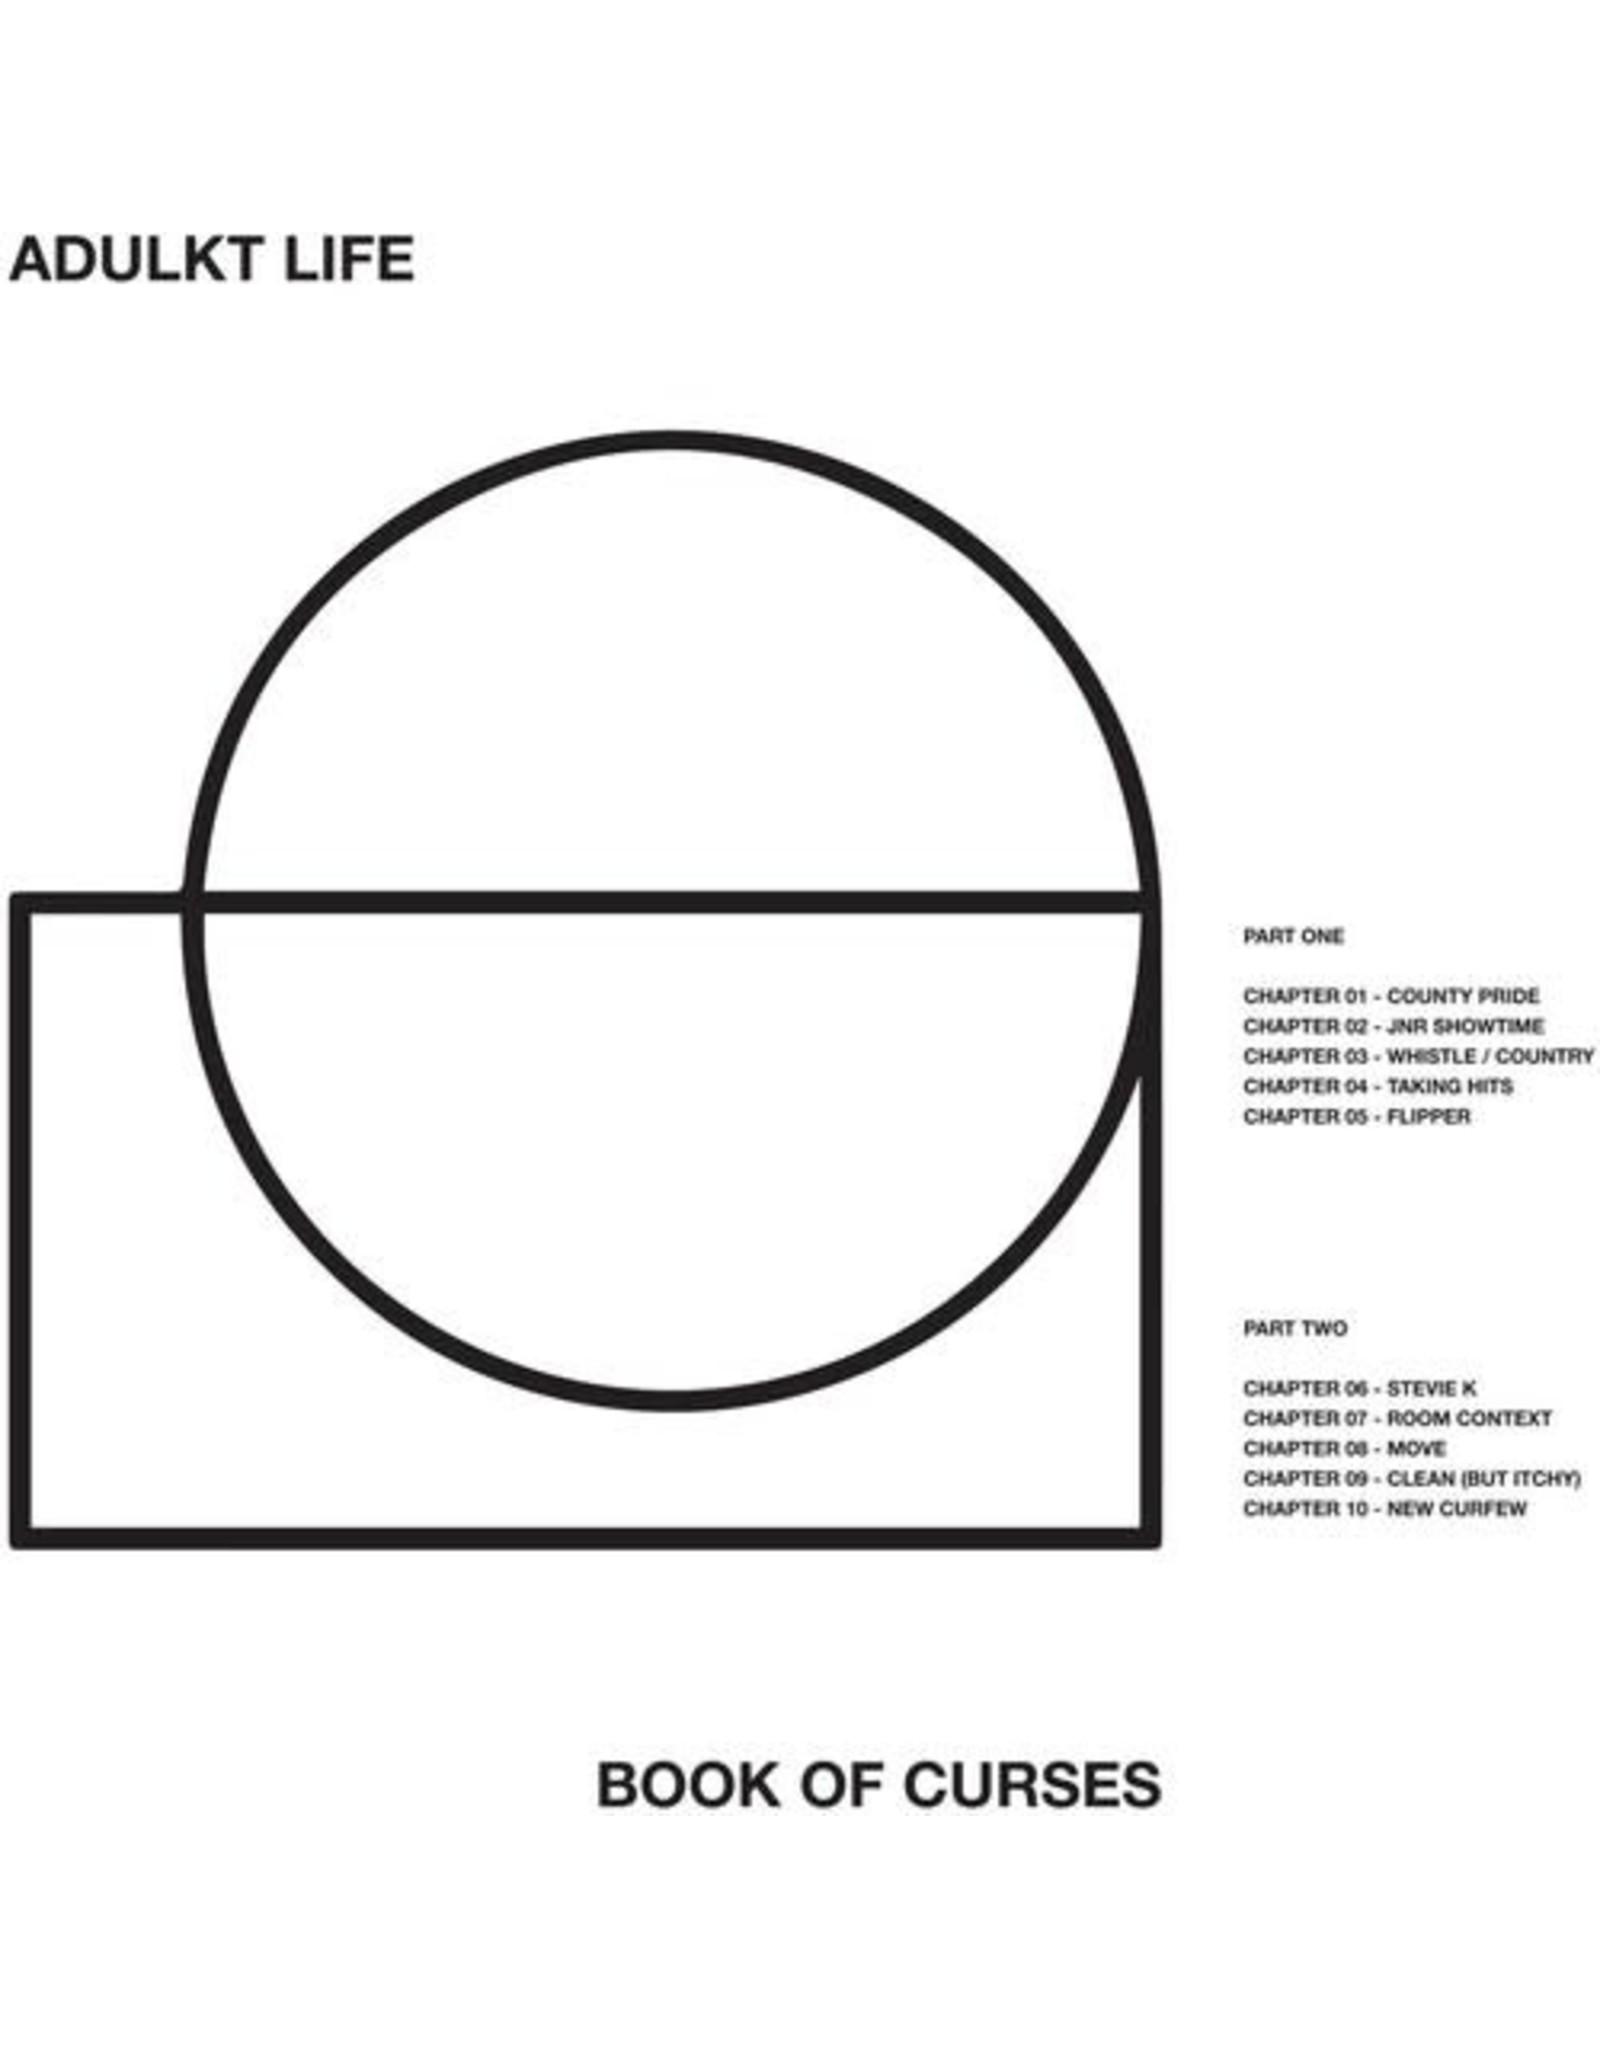 Adulkt Life / Mook Of Curses (White Vinyl)